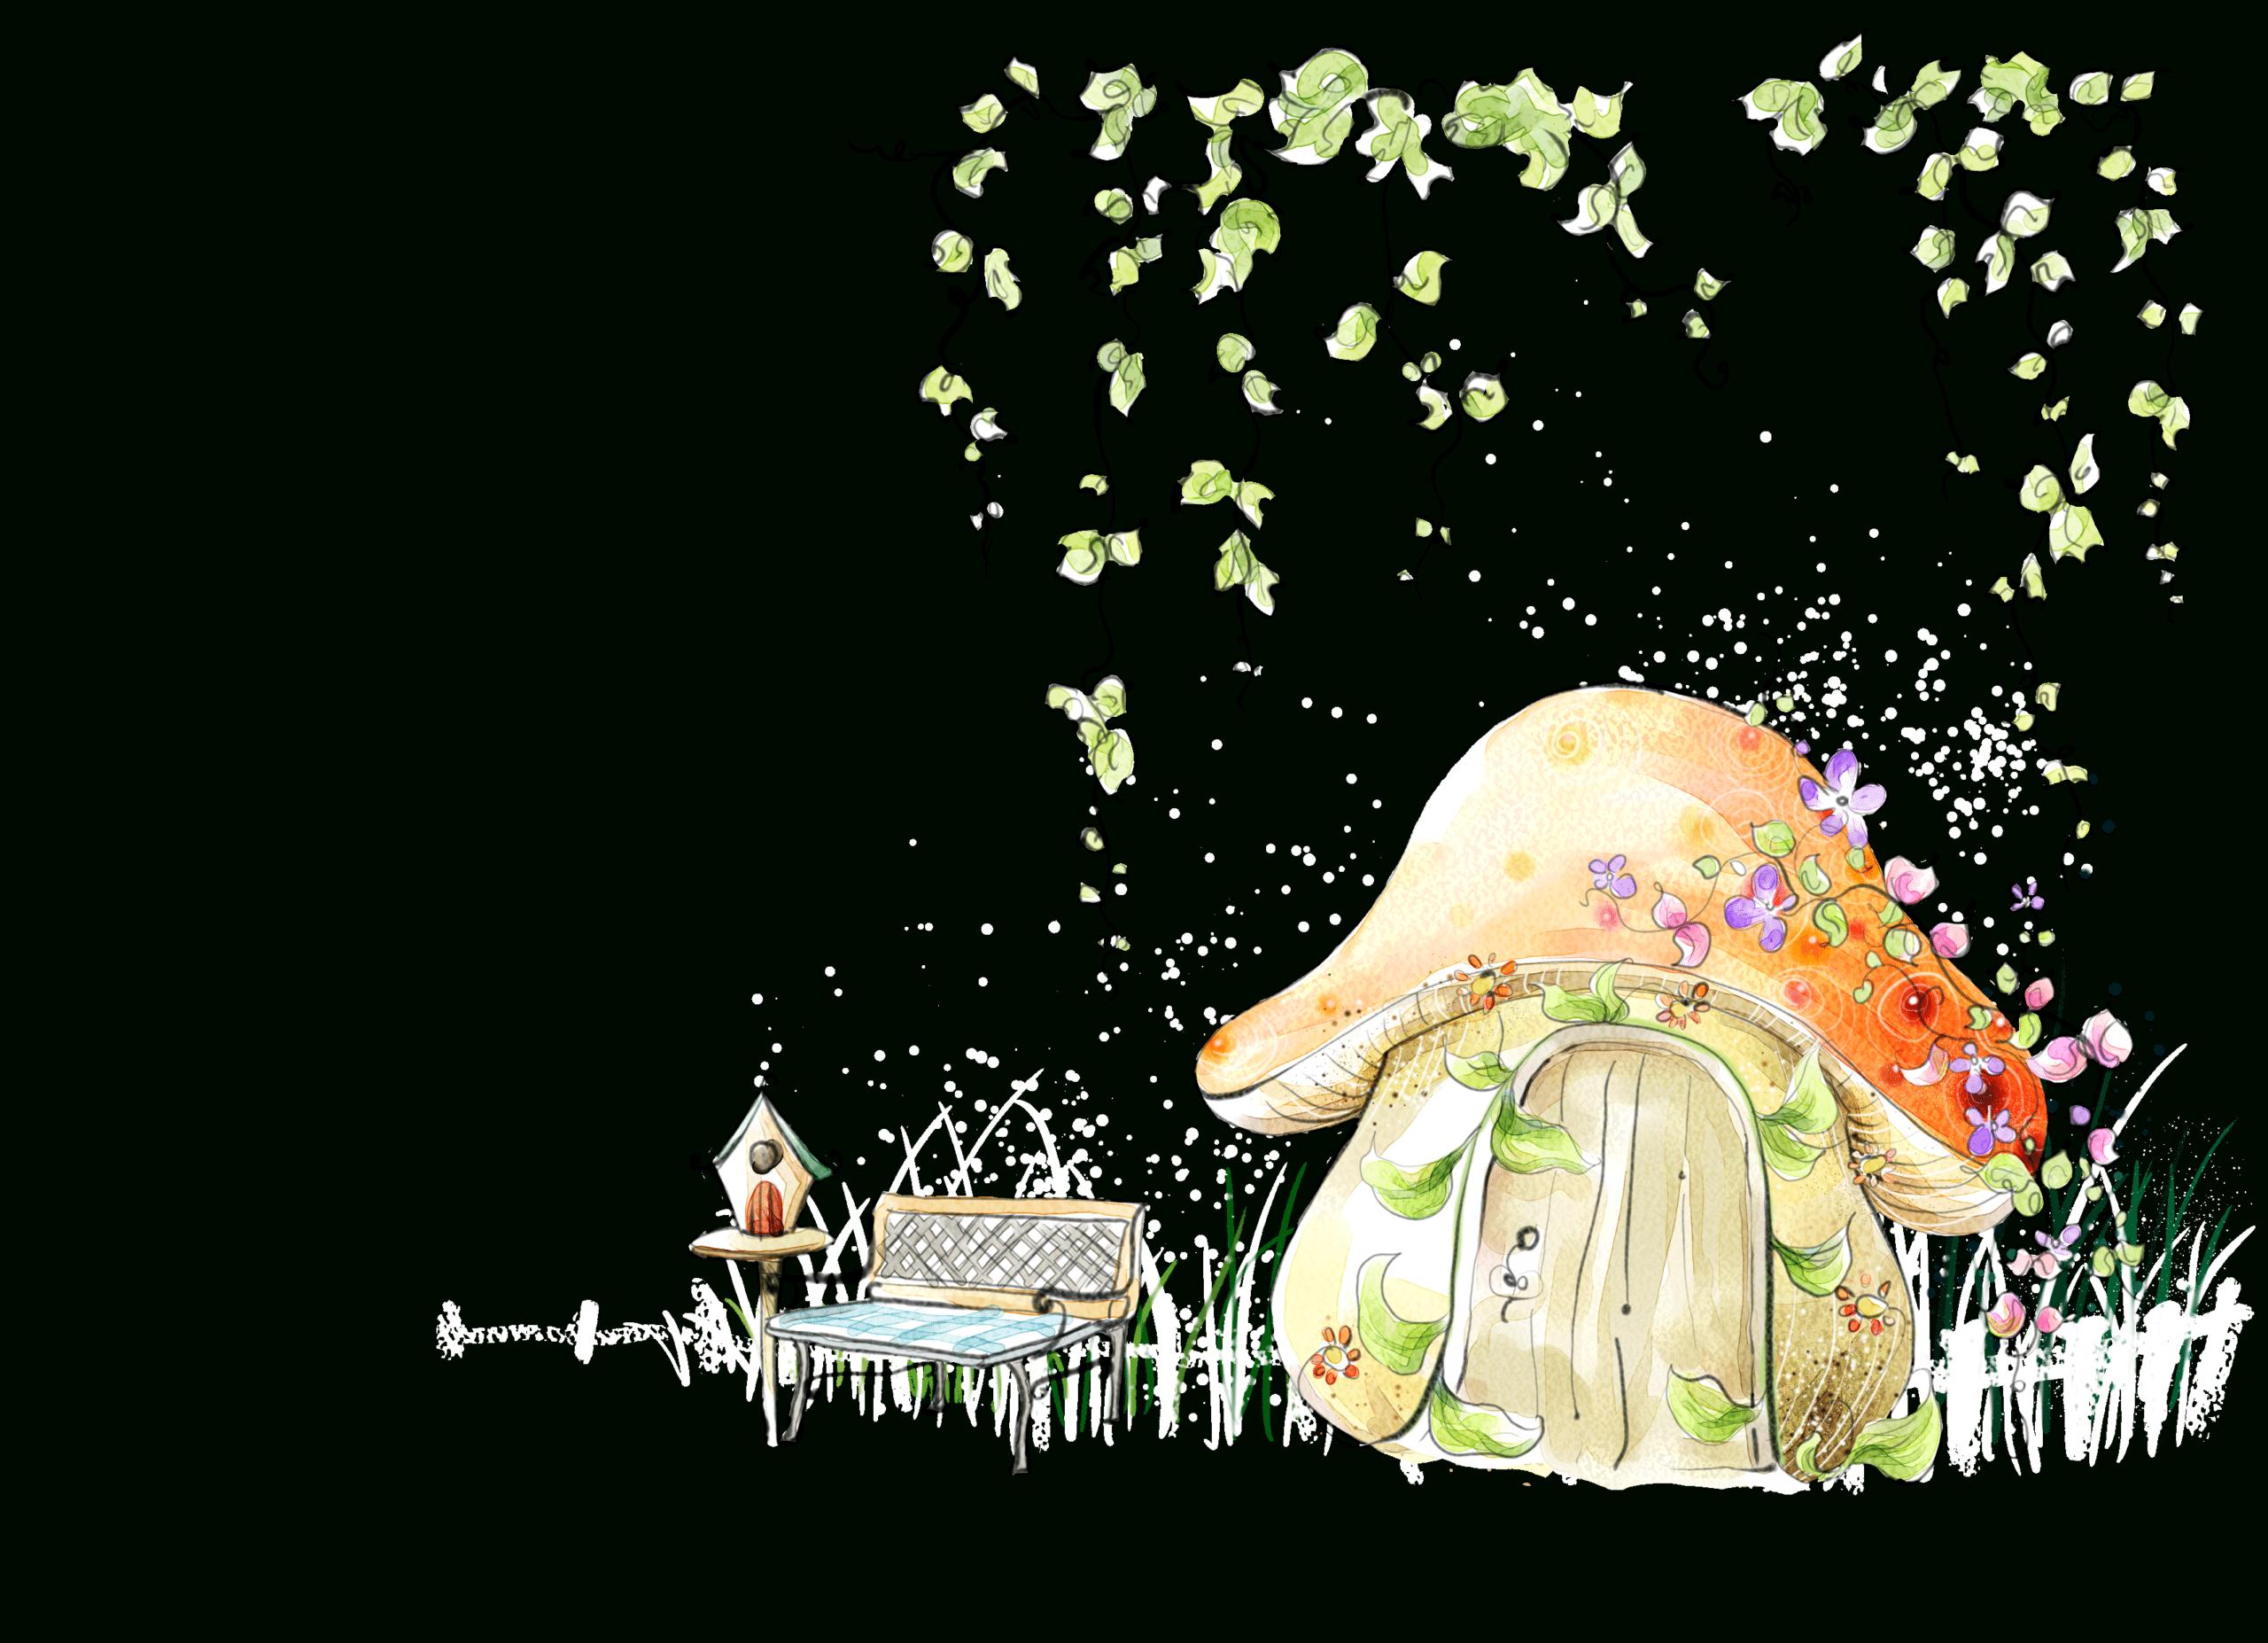 Fairy Tale Template Microsoft Powerpoint Illustration With Regard To Fairy Tale Powerpoint Template